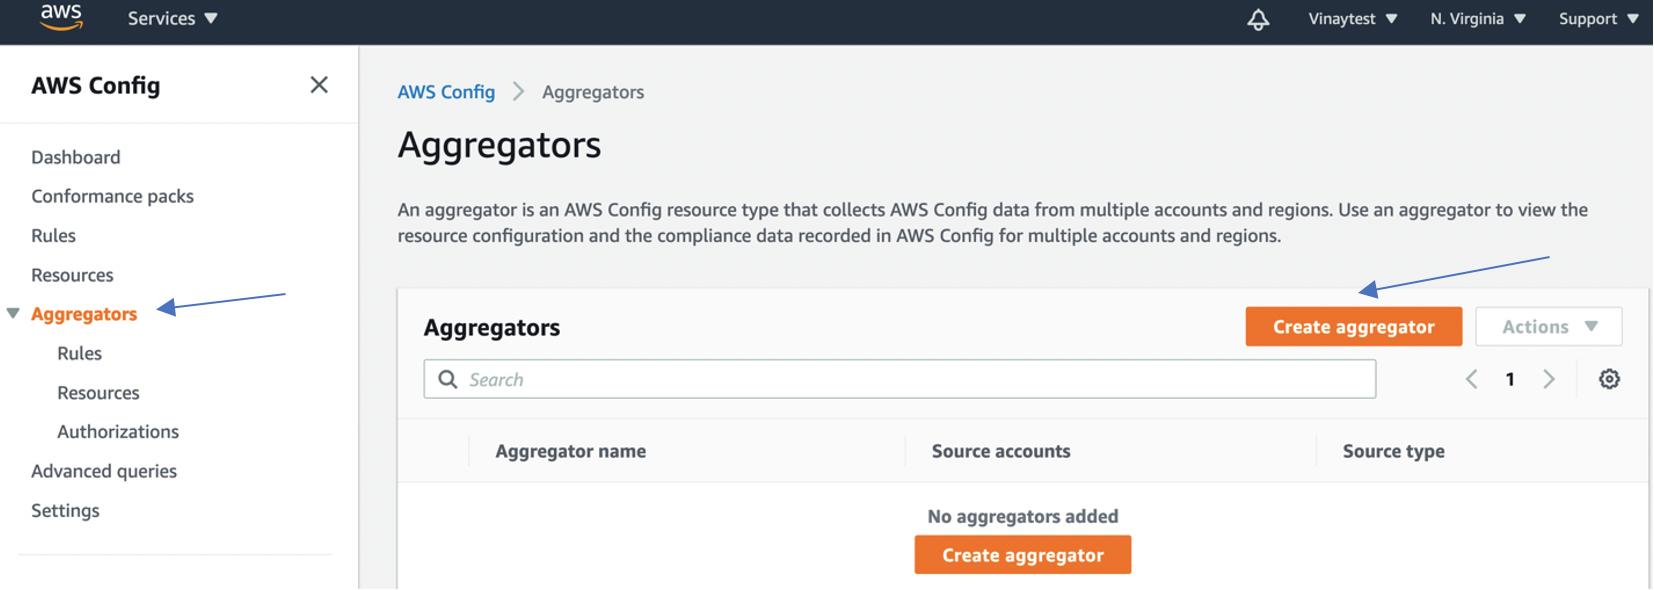 The Aggregators page provides a search field and a Create aggregator button.